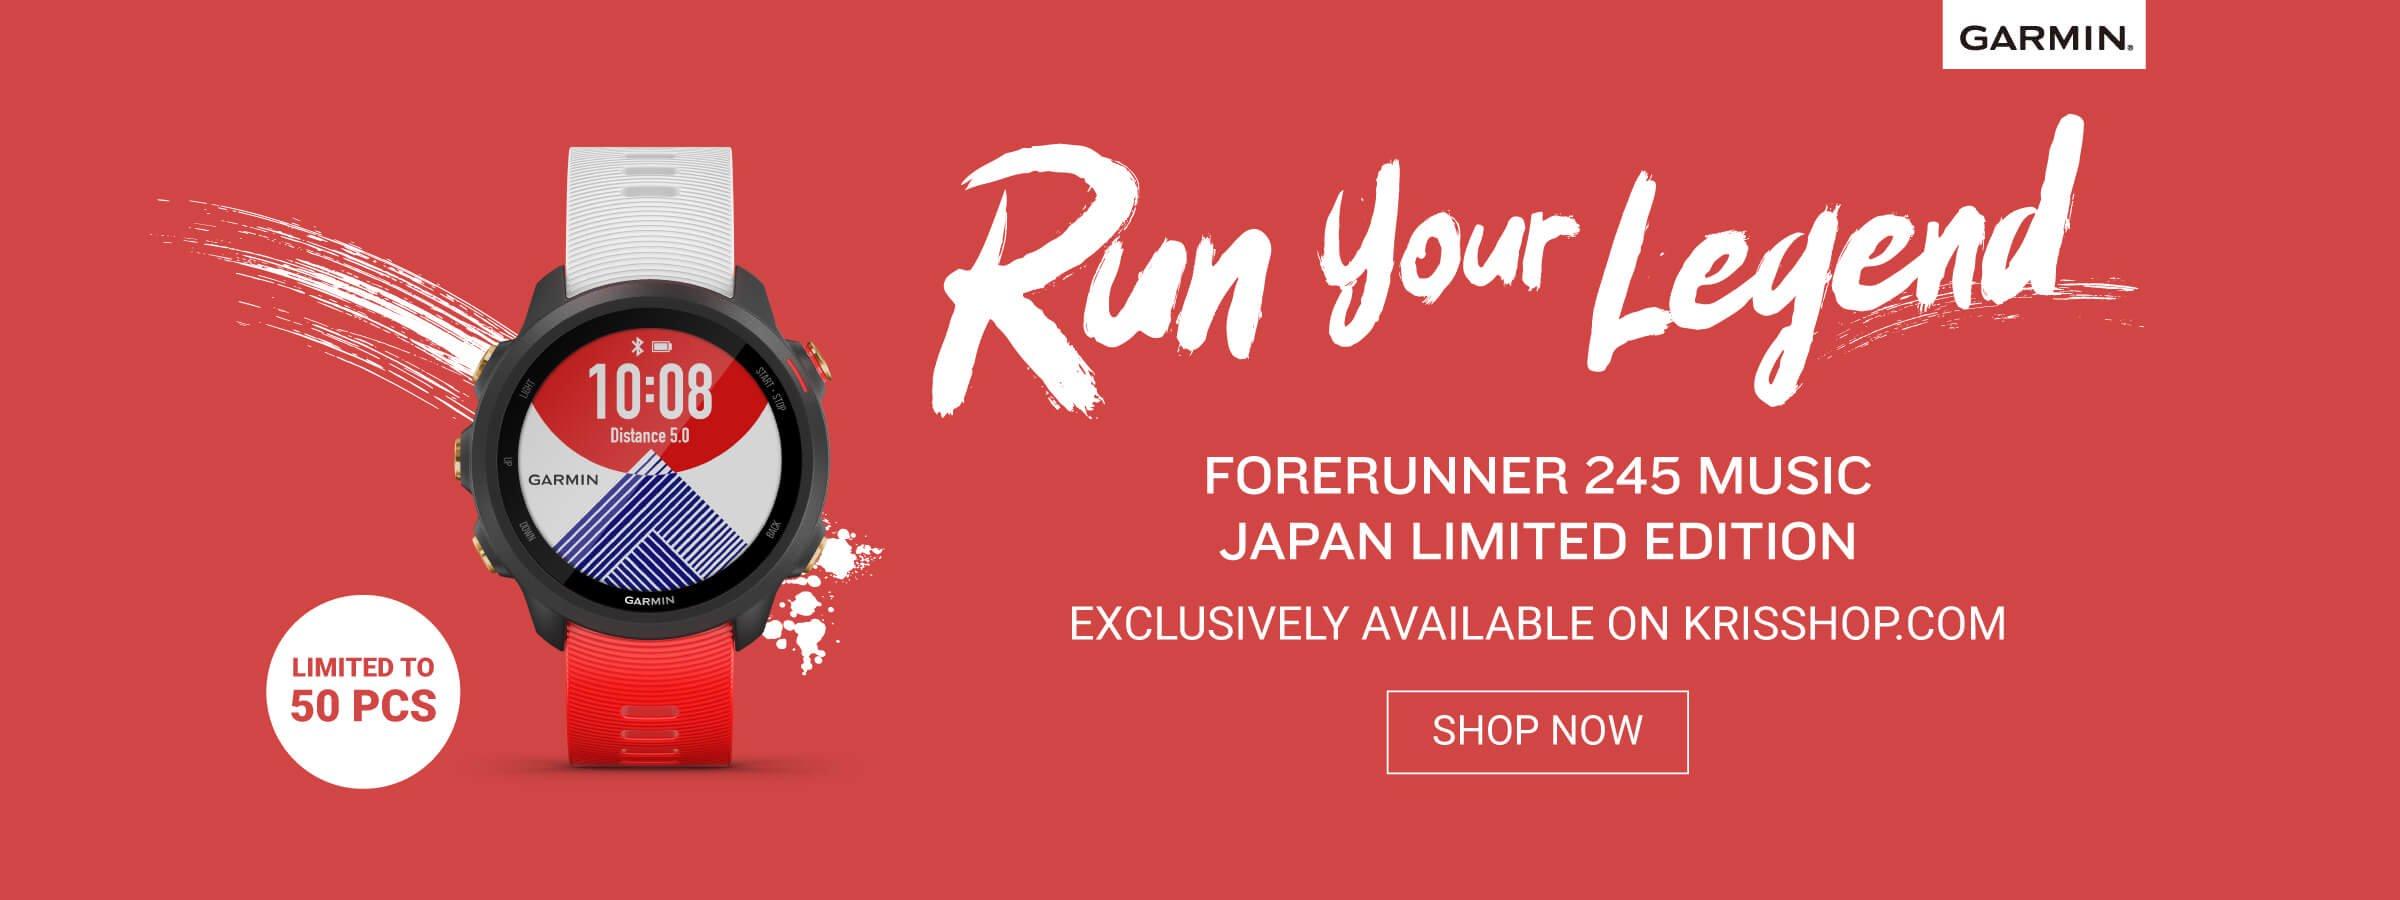 Garmin x KrisShop - Forerunner 245 Music Japan Limited Edition